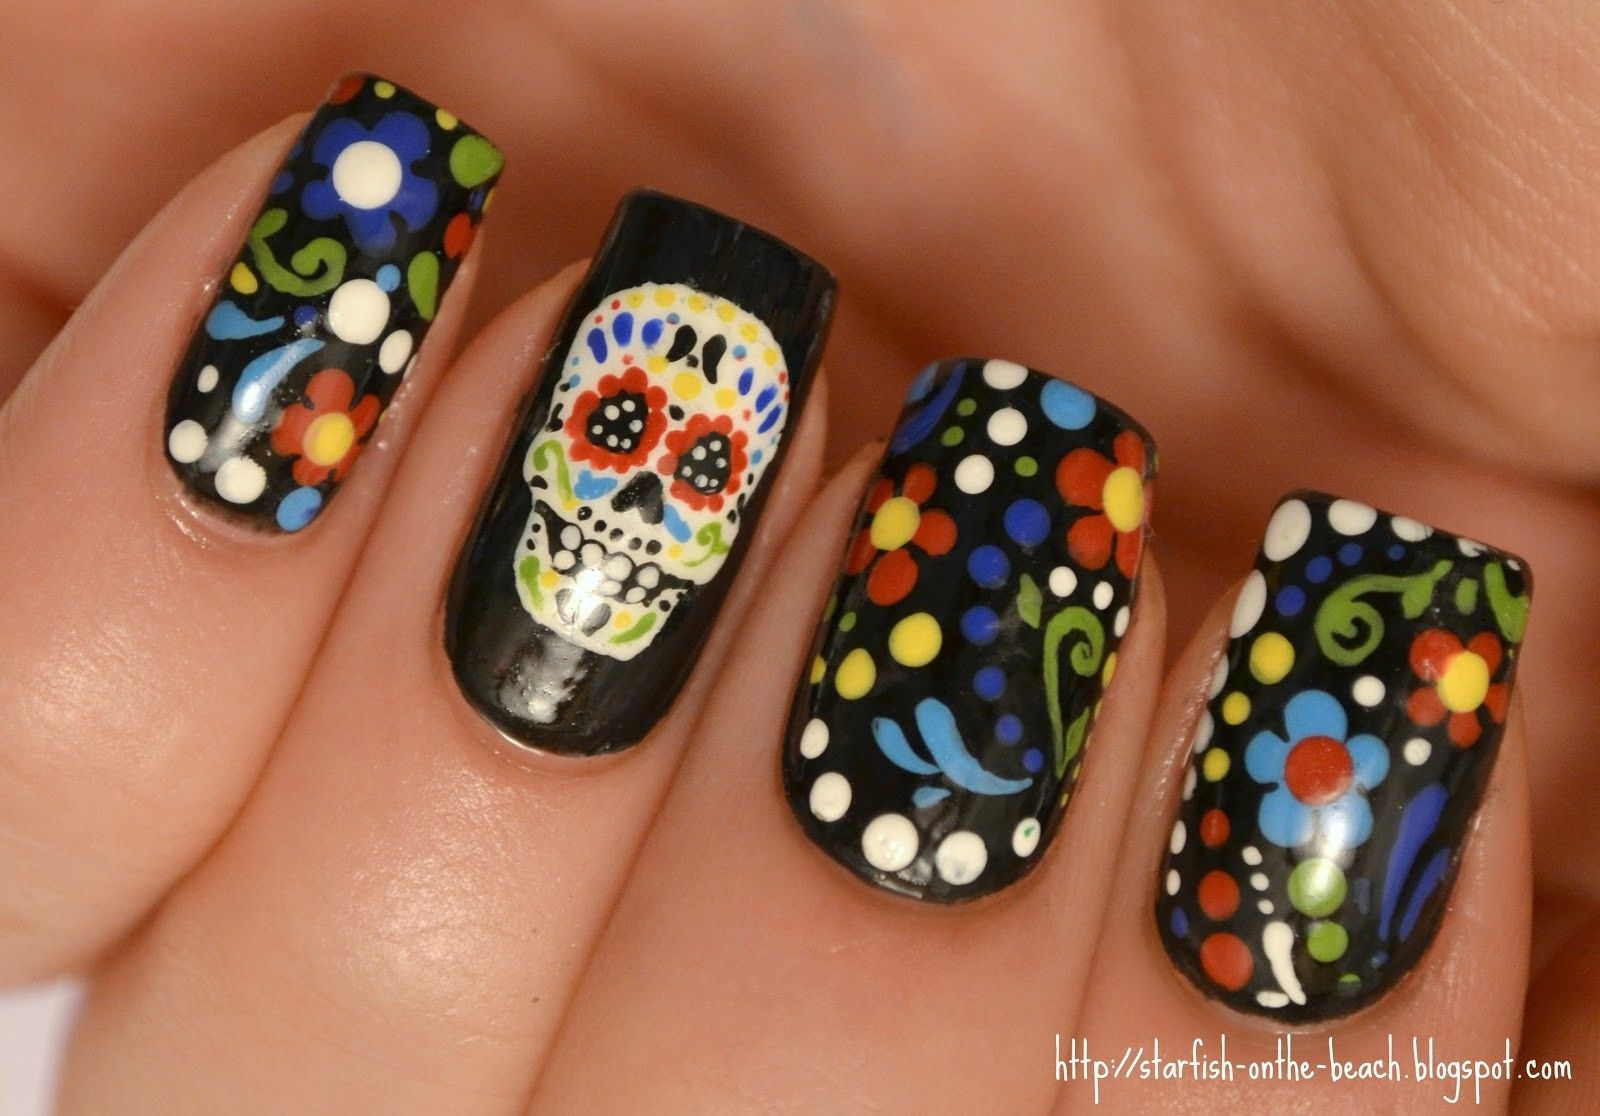 Pin by Yvonne Hernandez on Nails | Pinterest